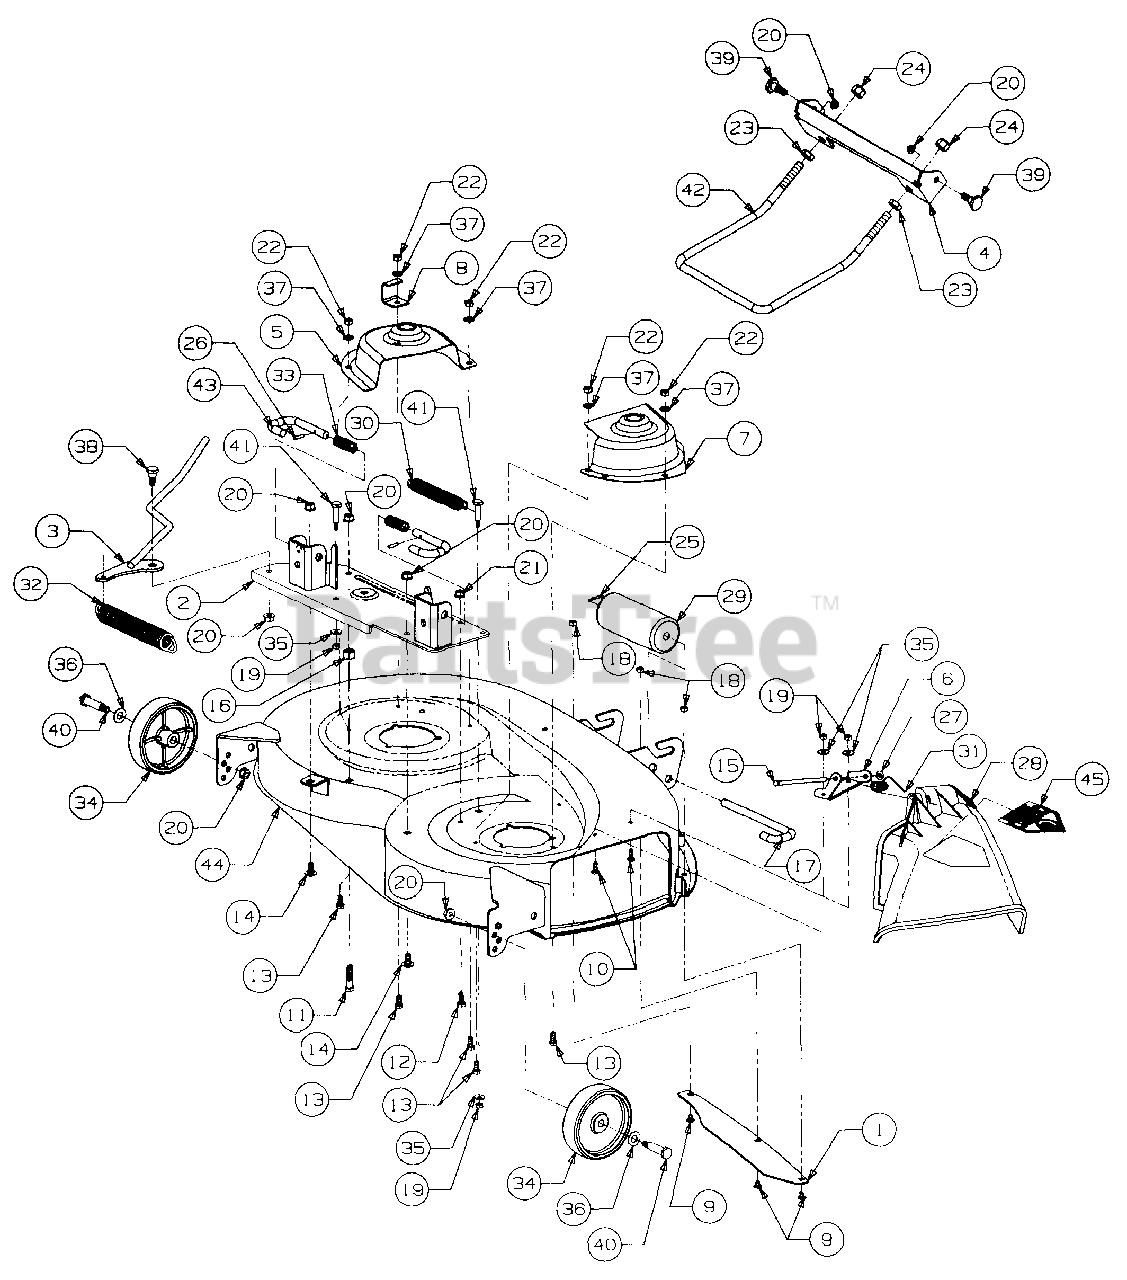 Cub Cadet Parts On The 38 U0026quot  Deck Assembly Diagram For 2130